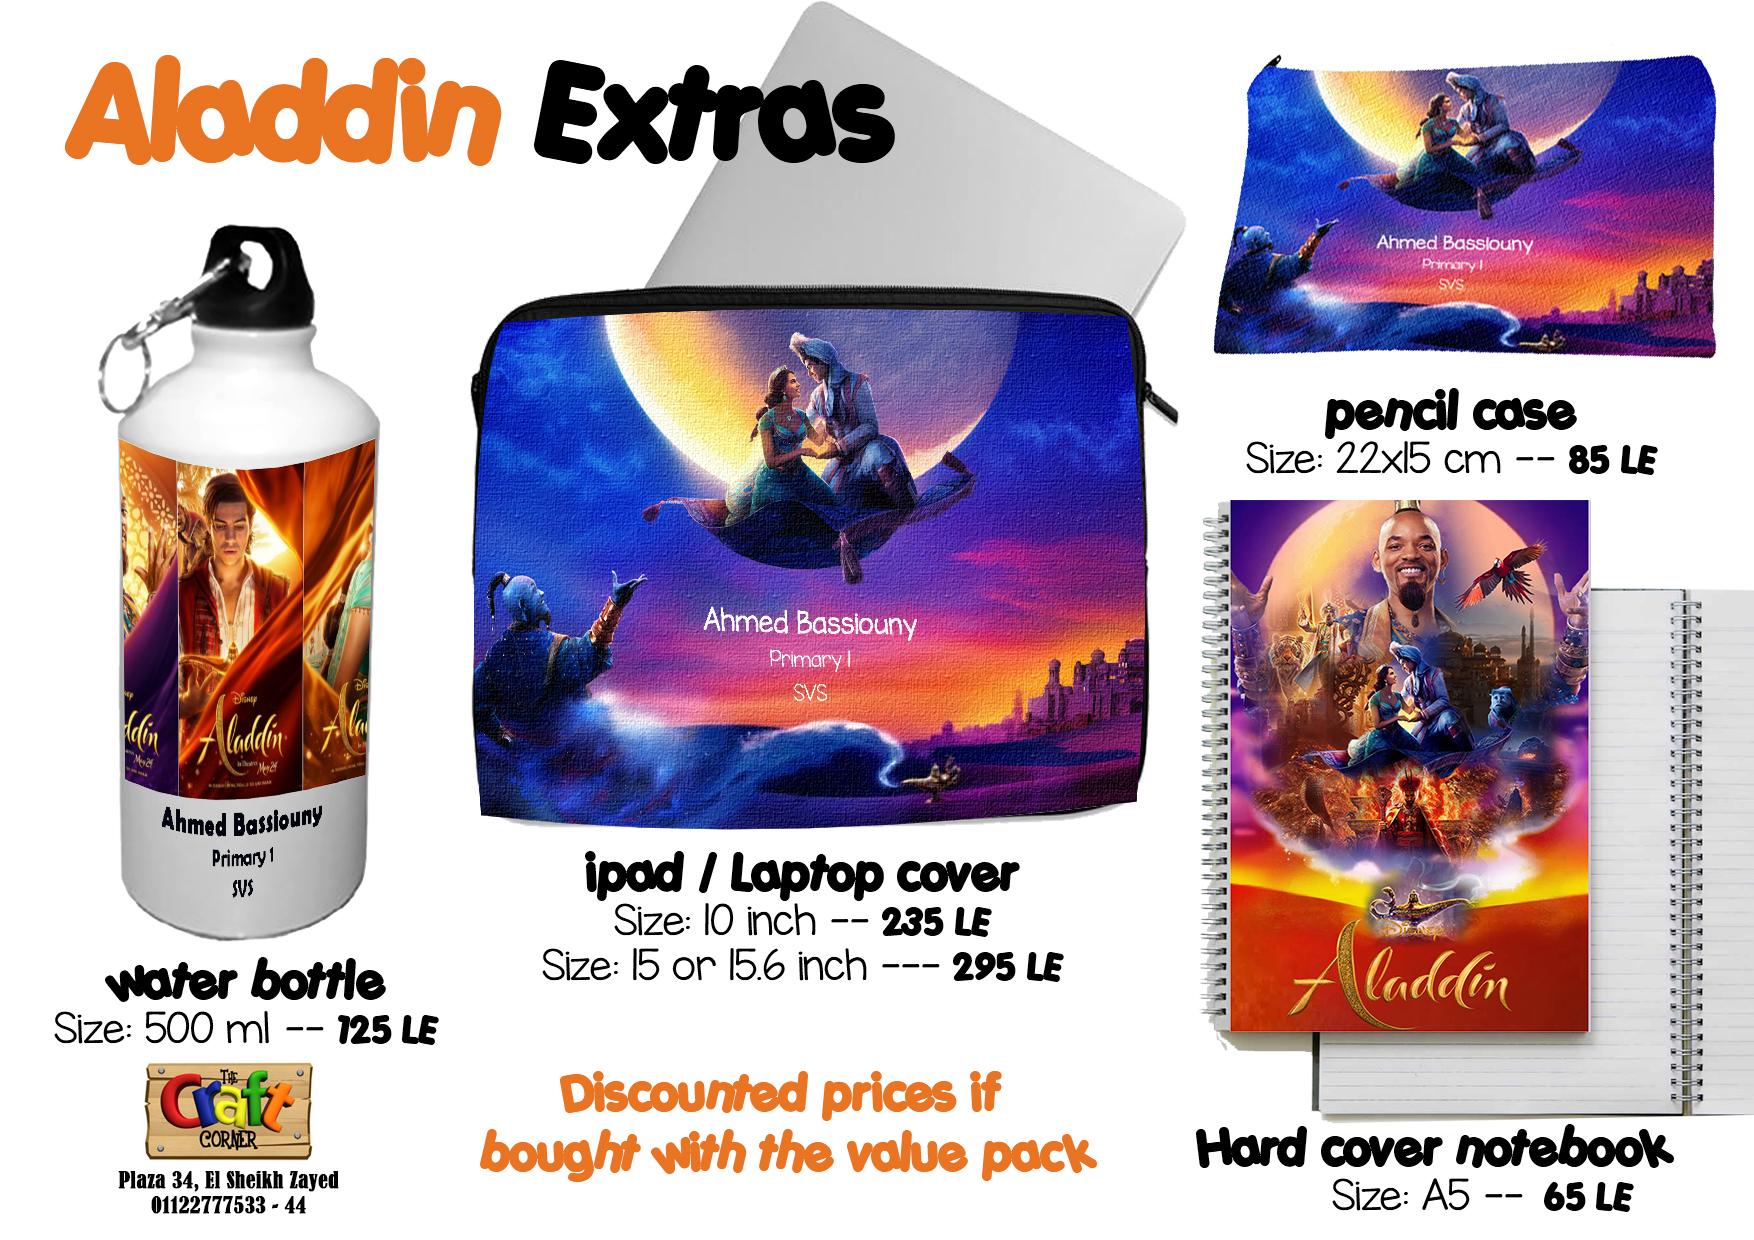 Aladdin extras